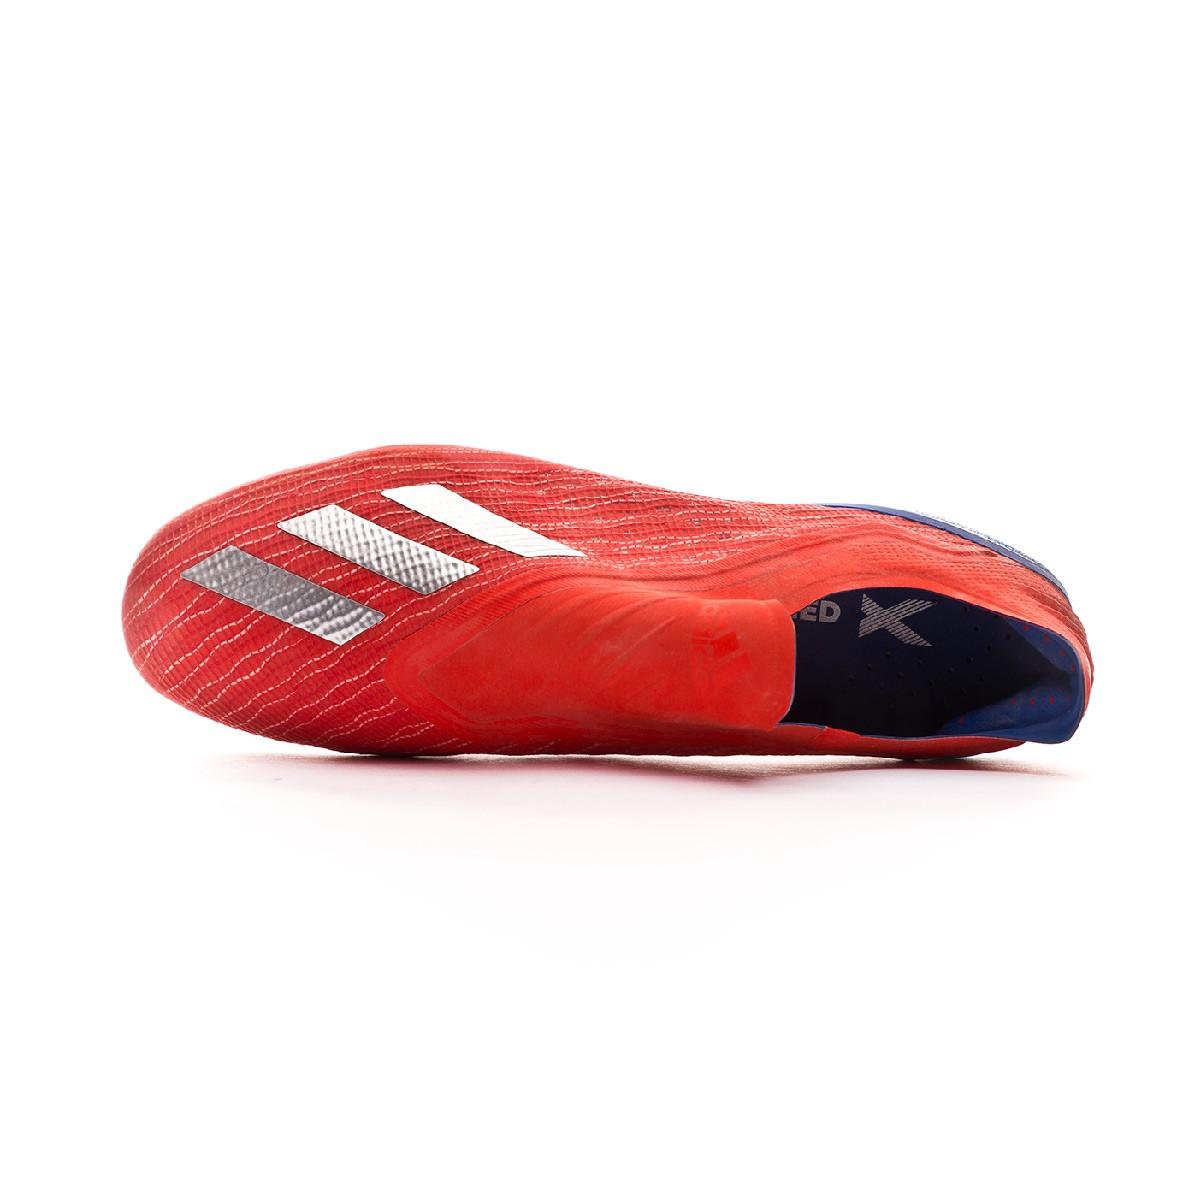 1b07031c5 Football Boots adidas X 18+ FG Active red-Silver metallic-Bold blue -  Football store Fútbol Emotion